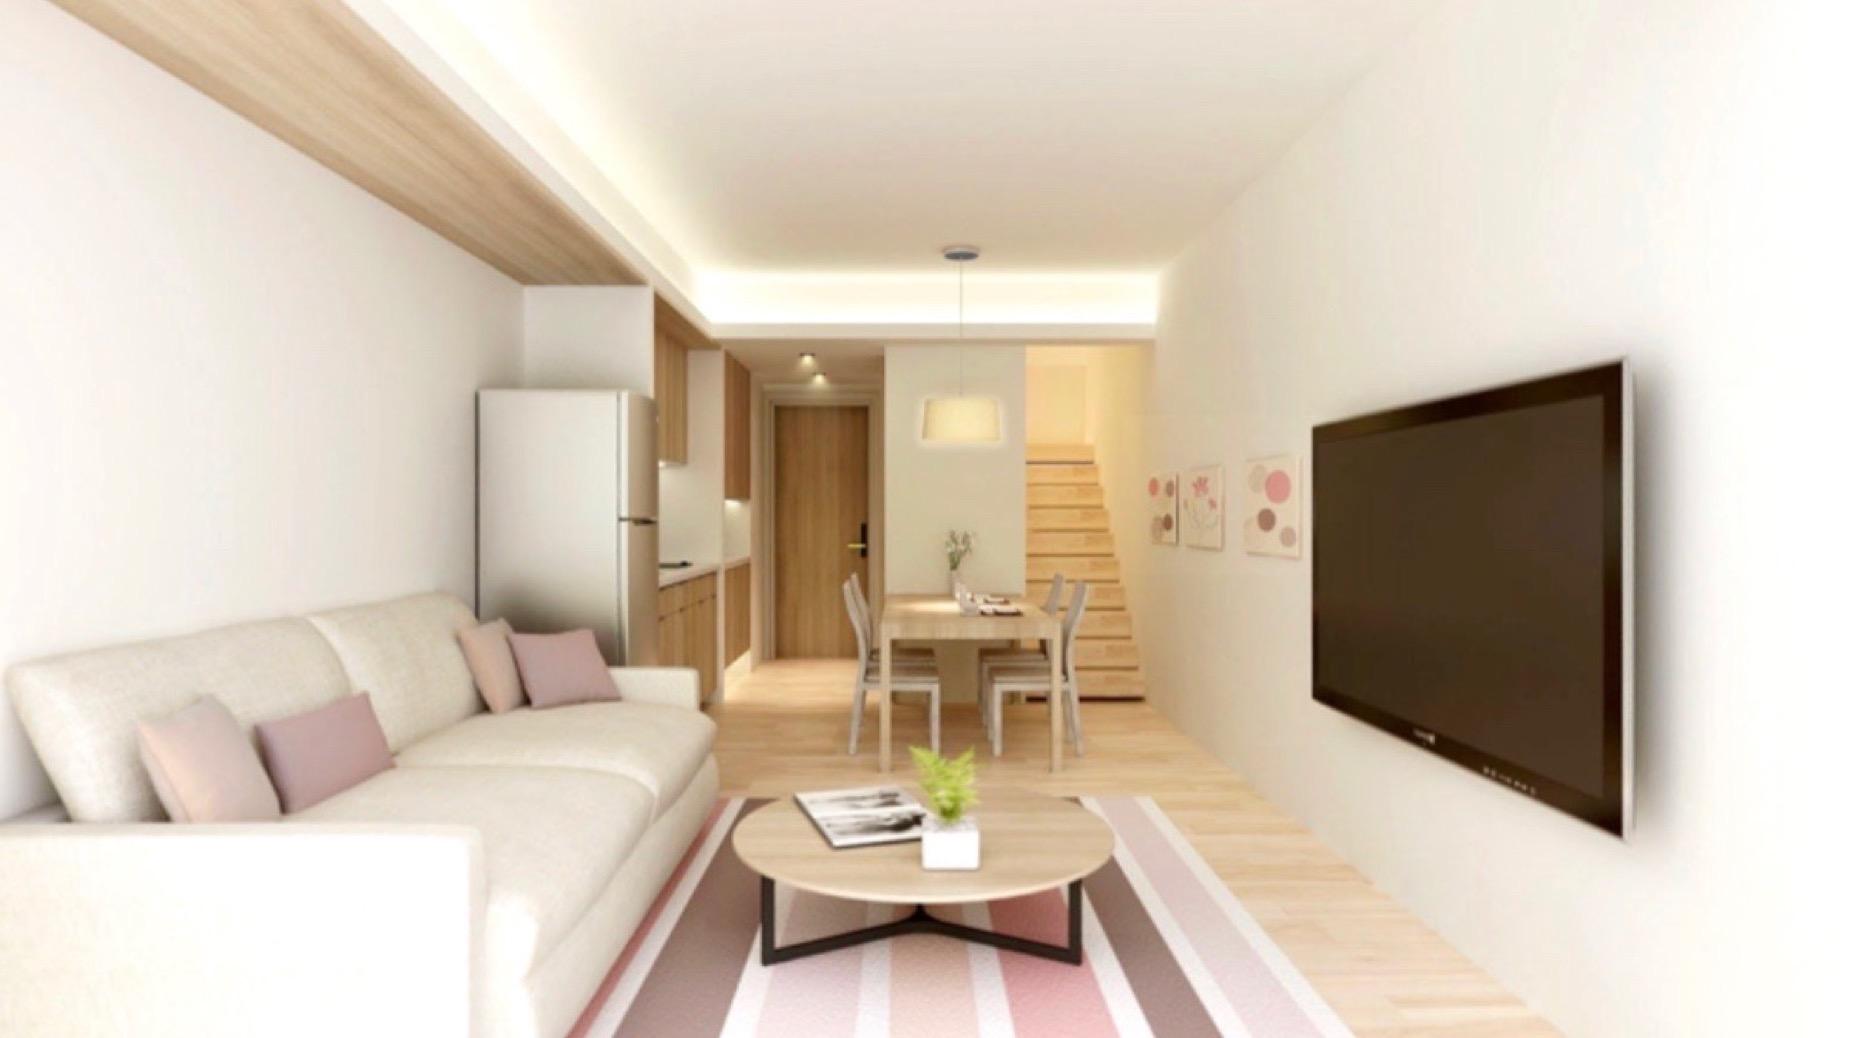 德築-DEZU-project-Zuyin-architecture-building-3Drendering-3